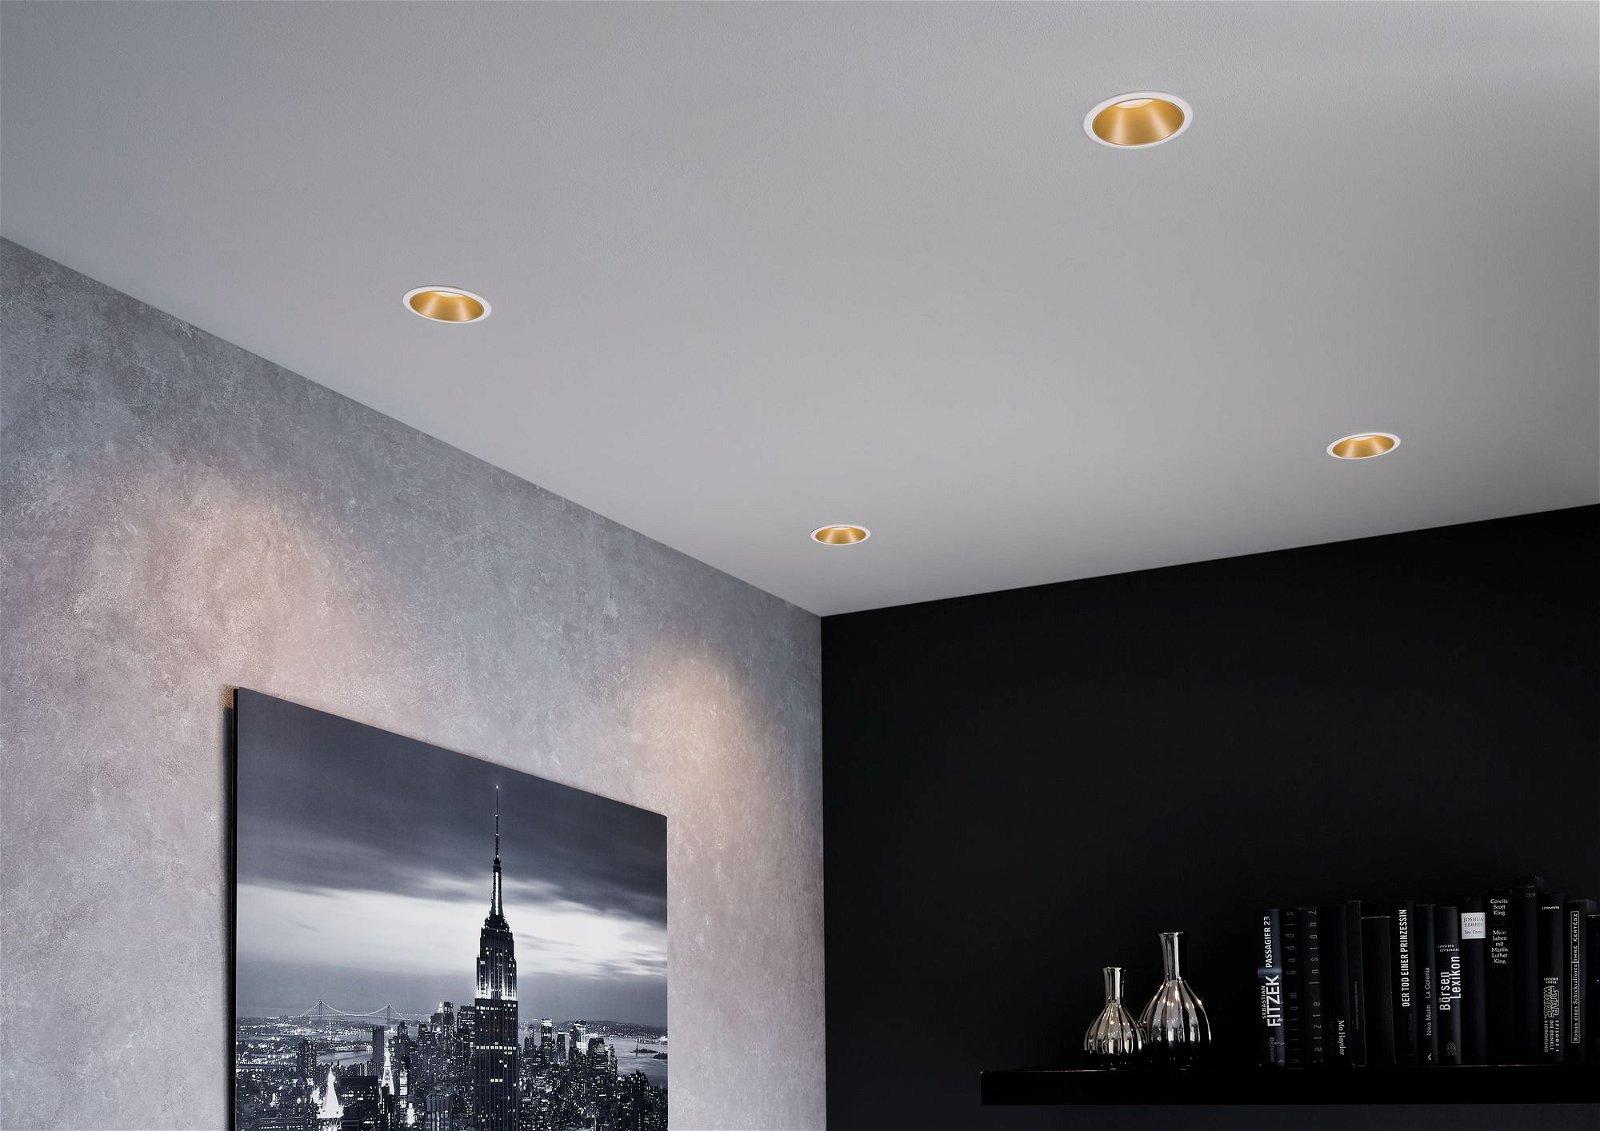 LED-inbouwlamp 3-Step-Dim Cole Coin Basisset IP44 rond 88mm Coin 3x6W 3x470lm 230V 2700K Wit/Goud mat